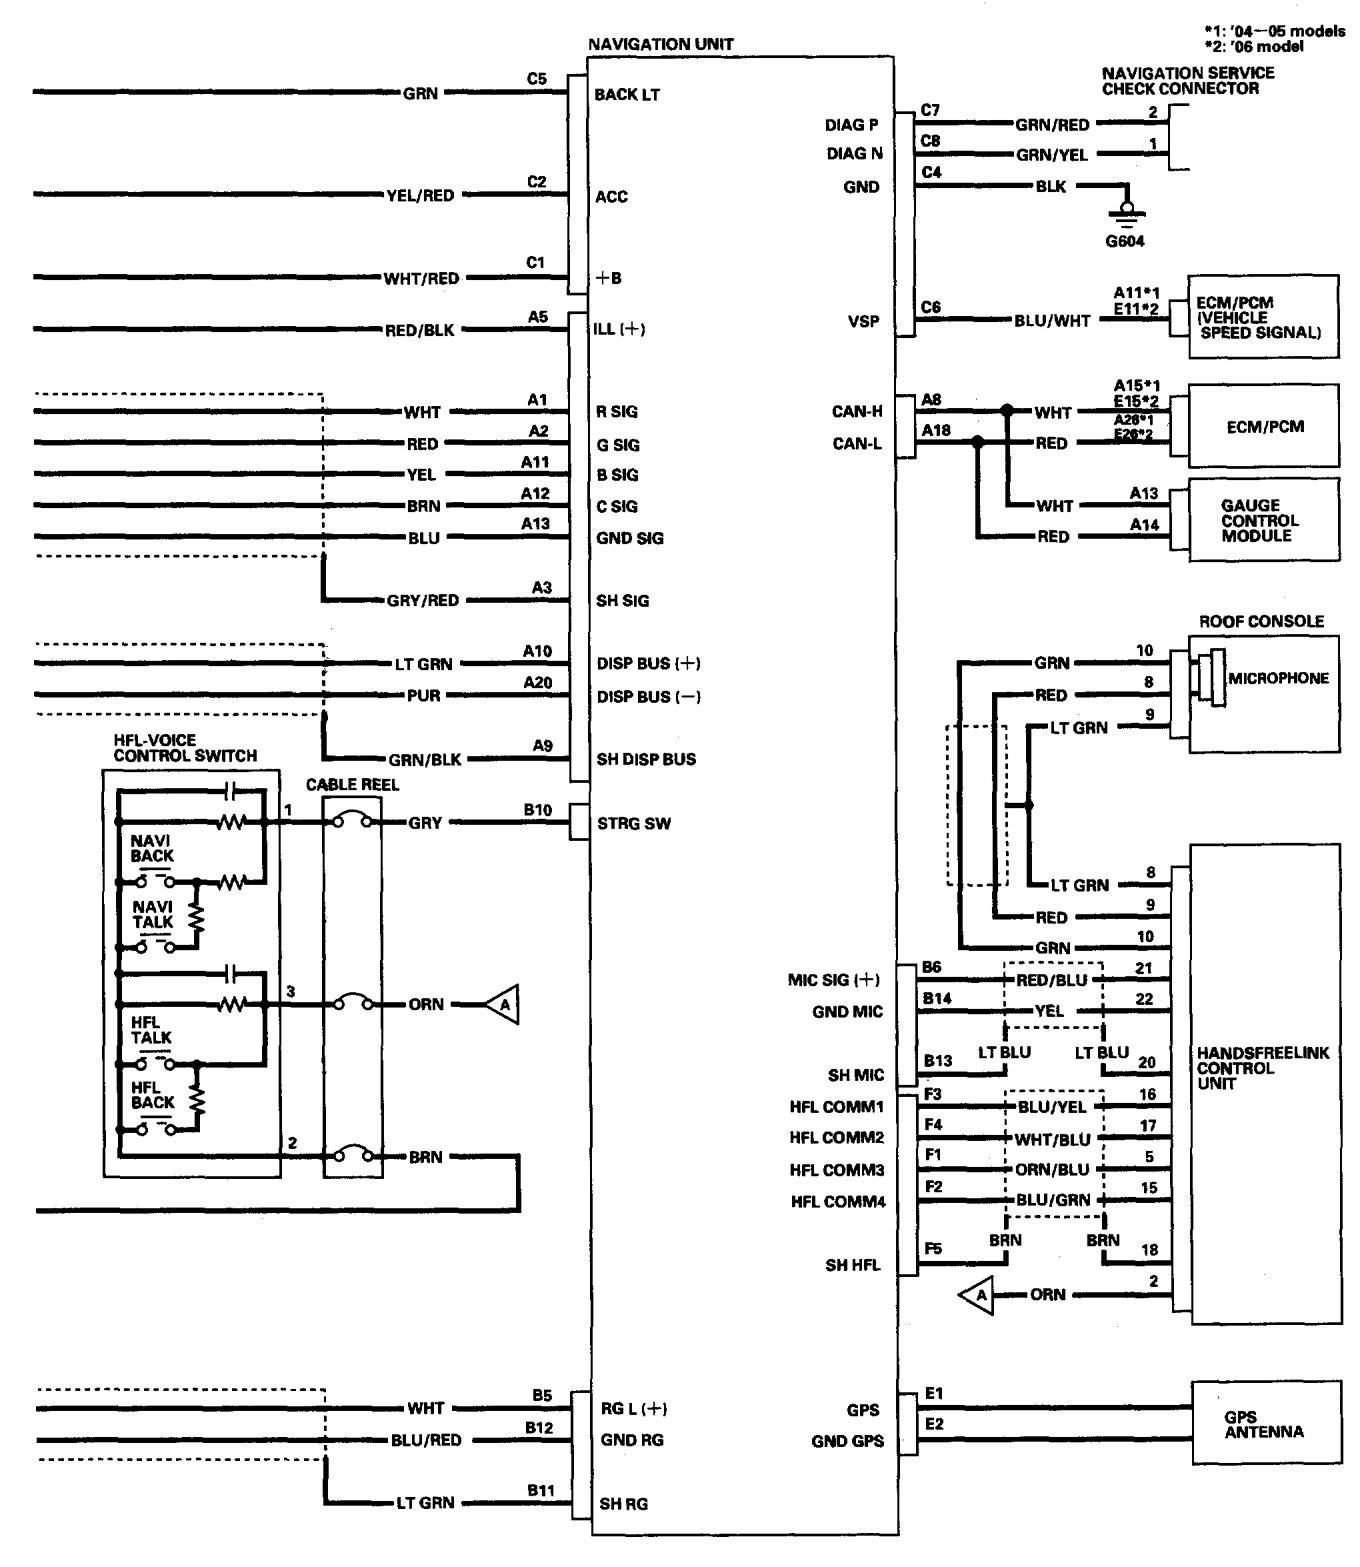 acura 2008 wiring diagram wiring diagram  2008 acura tl wiring arm disarm wiring diagram read 2008 acura mdx alarm wiring diagram 2008